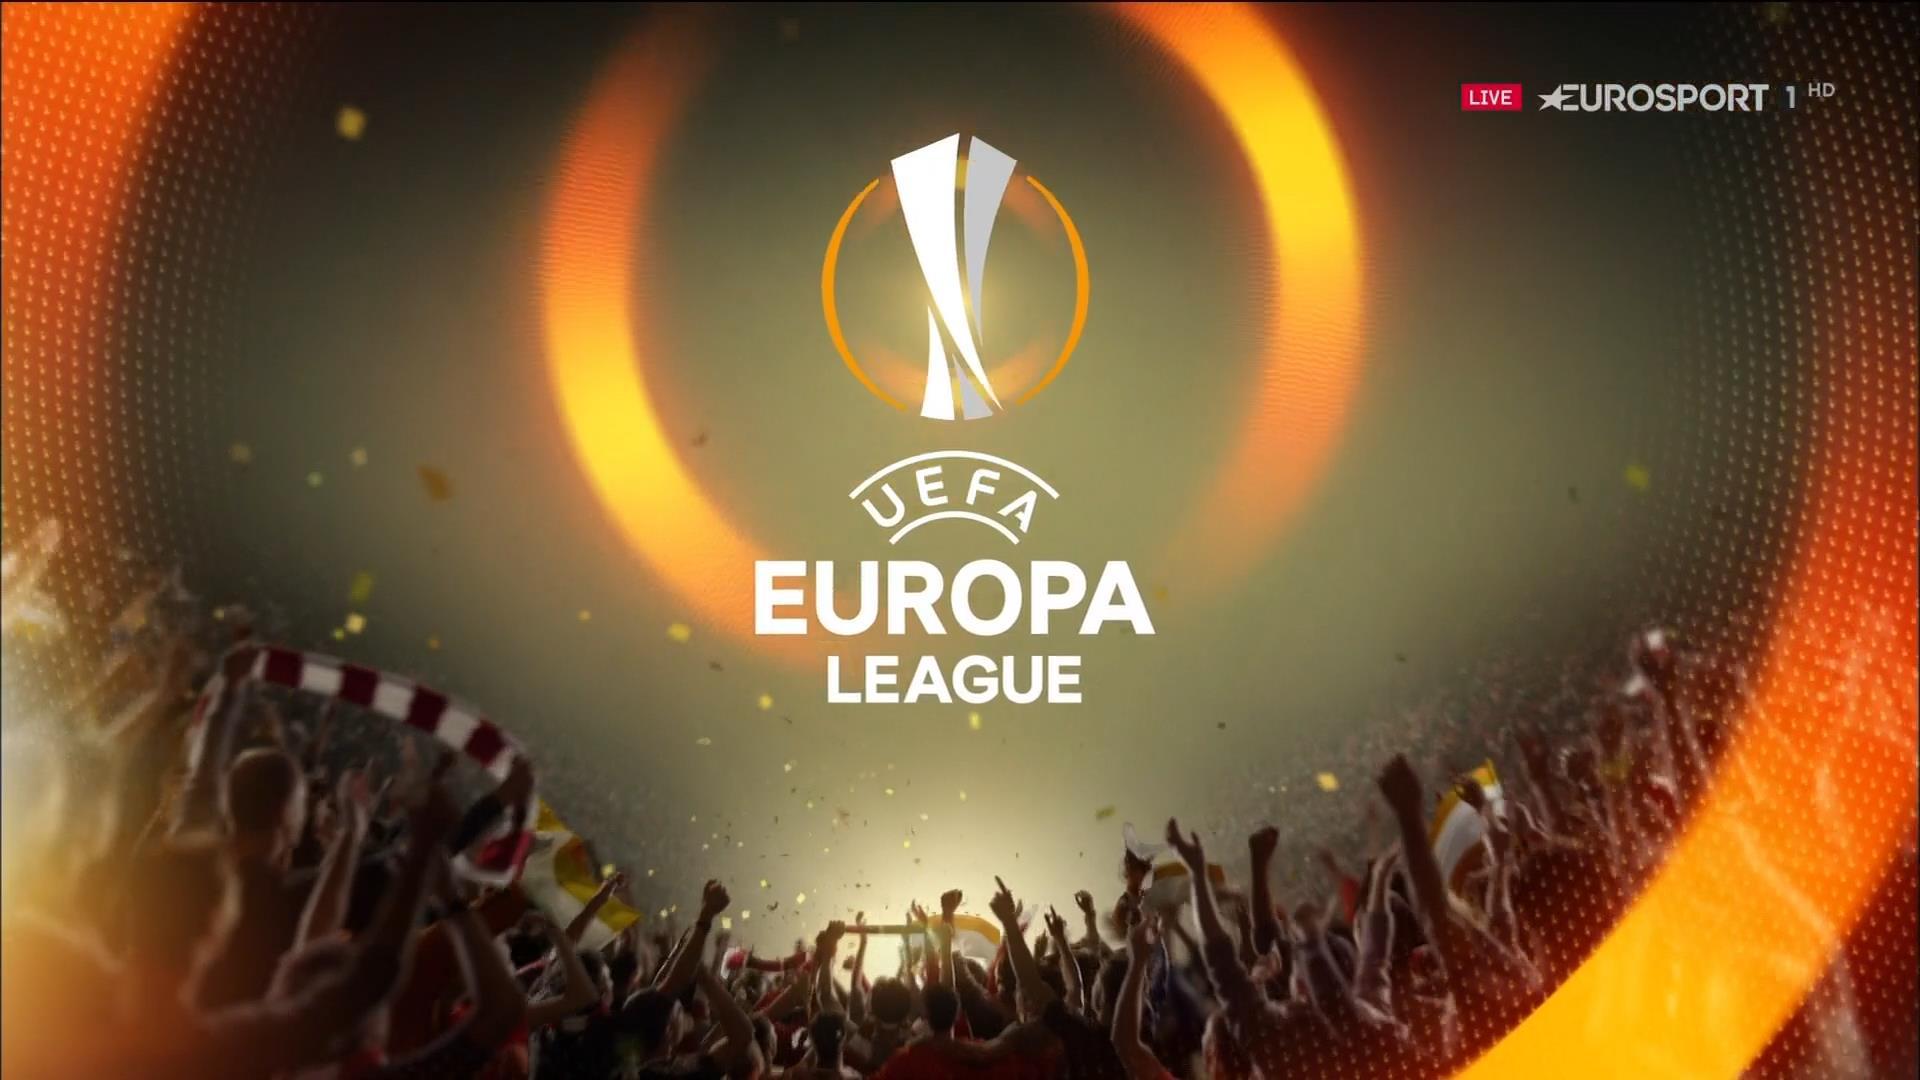 europa league - photo #17